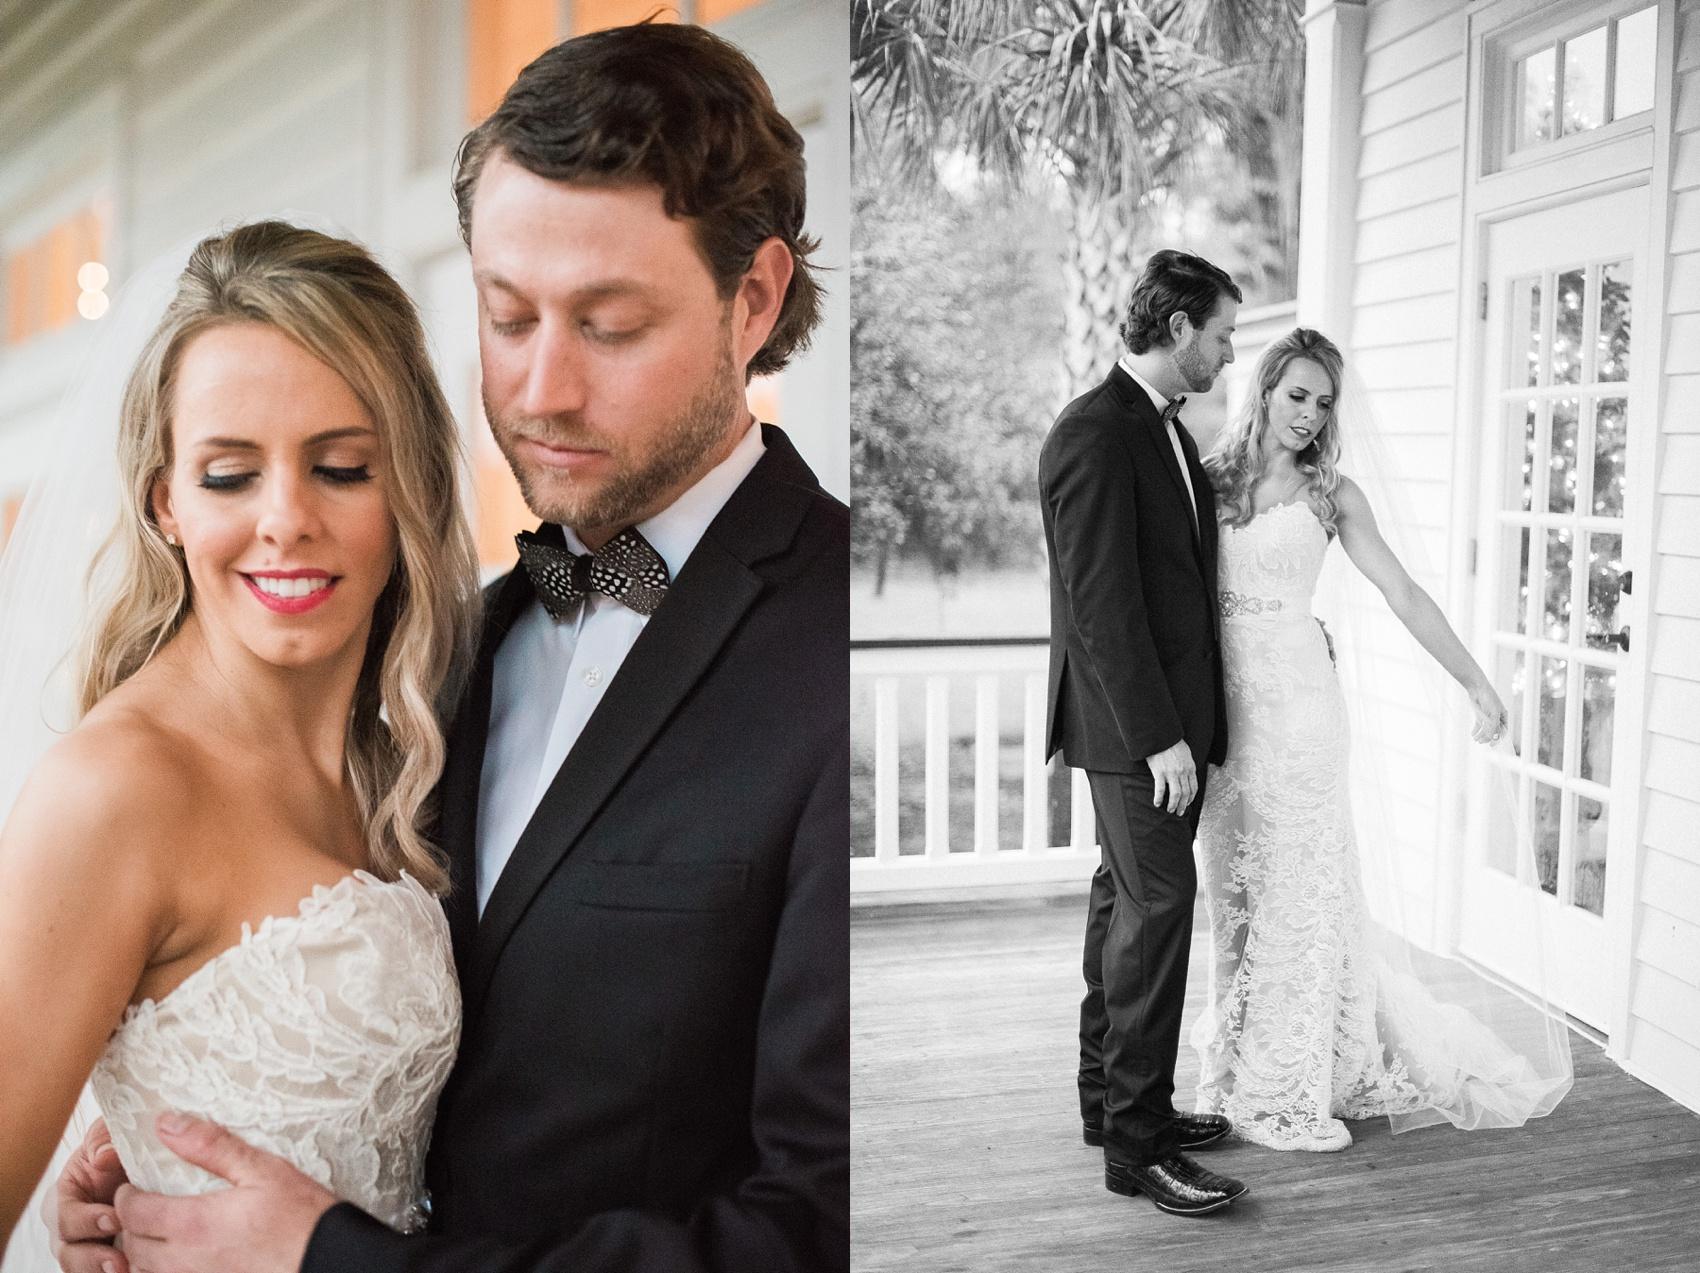 South_carolina_wedding_photographer_0055.jpg